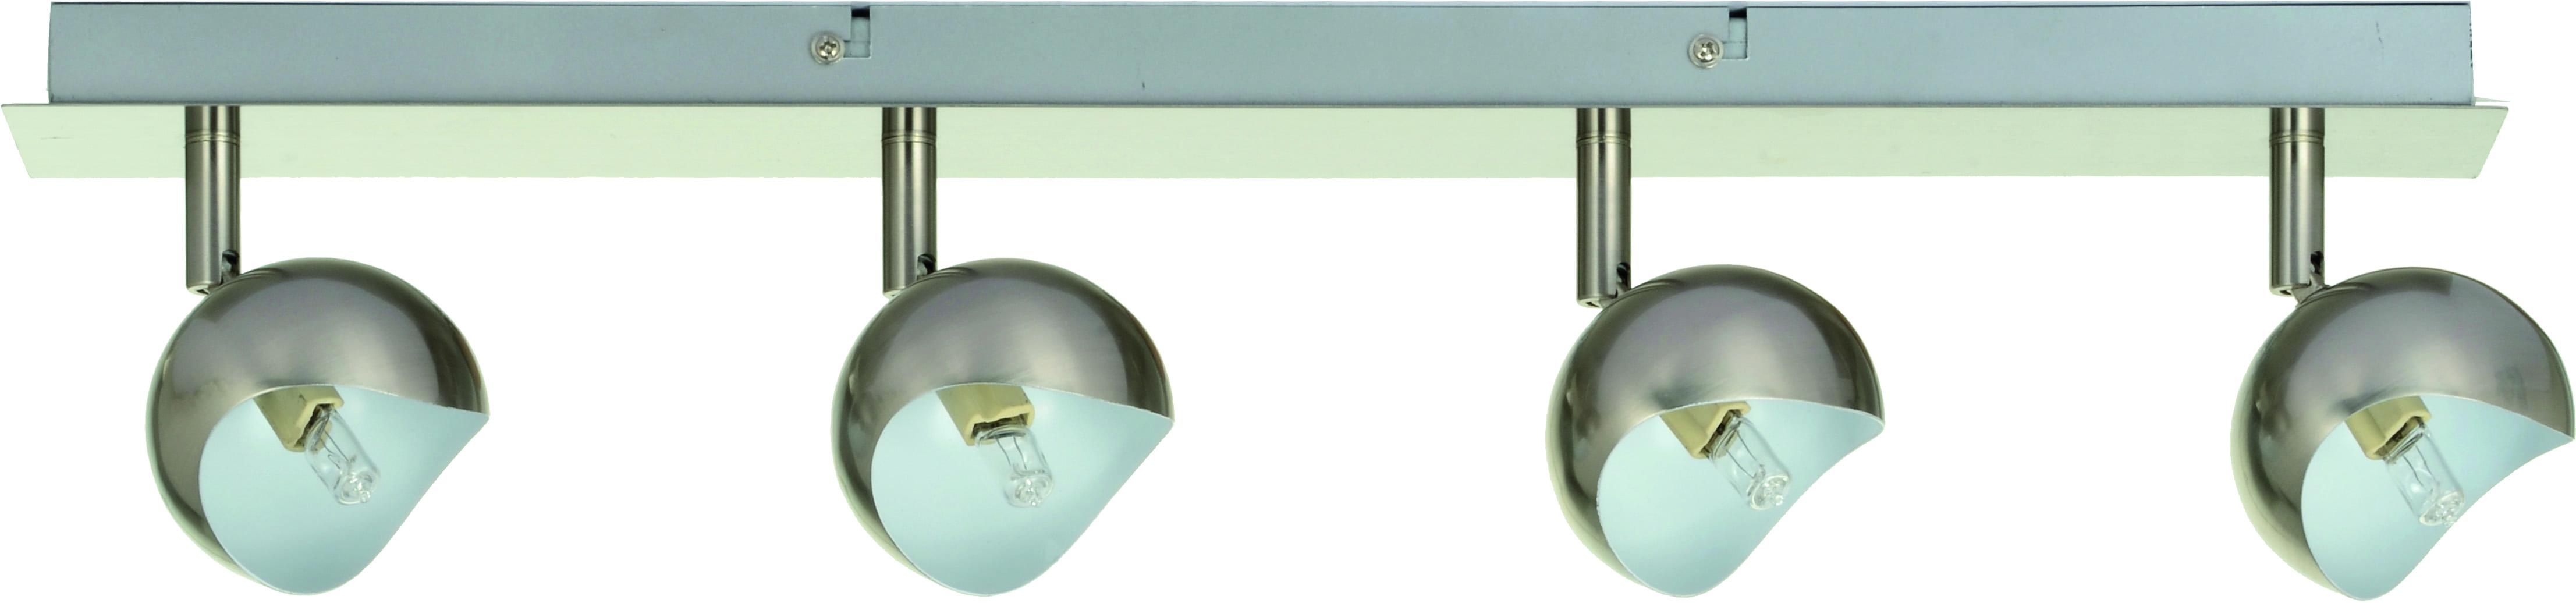 Kumi G9 28W Reflector Ceiling Lamp